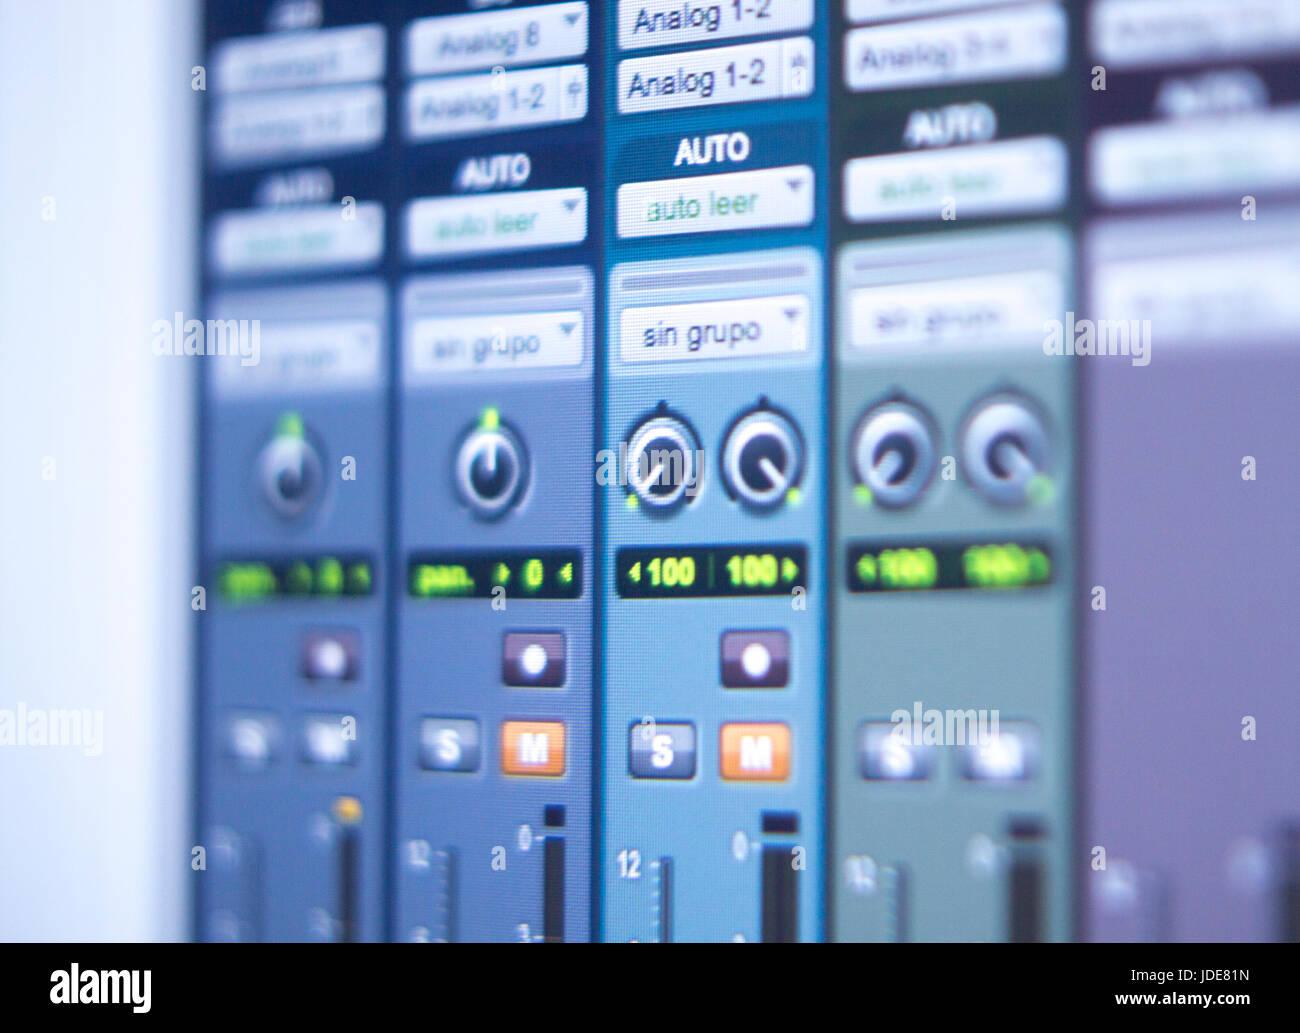 recording audio music vocal and voiceover studio digital mixing